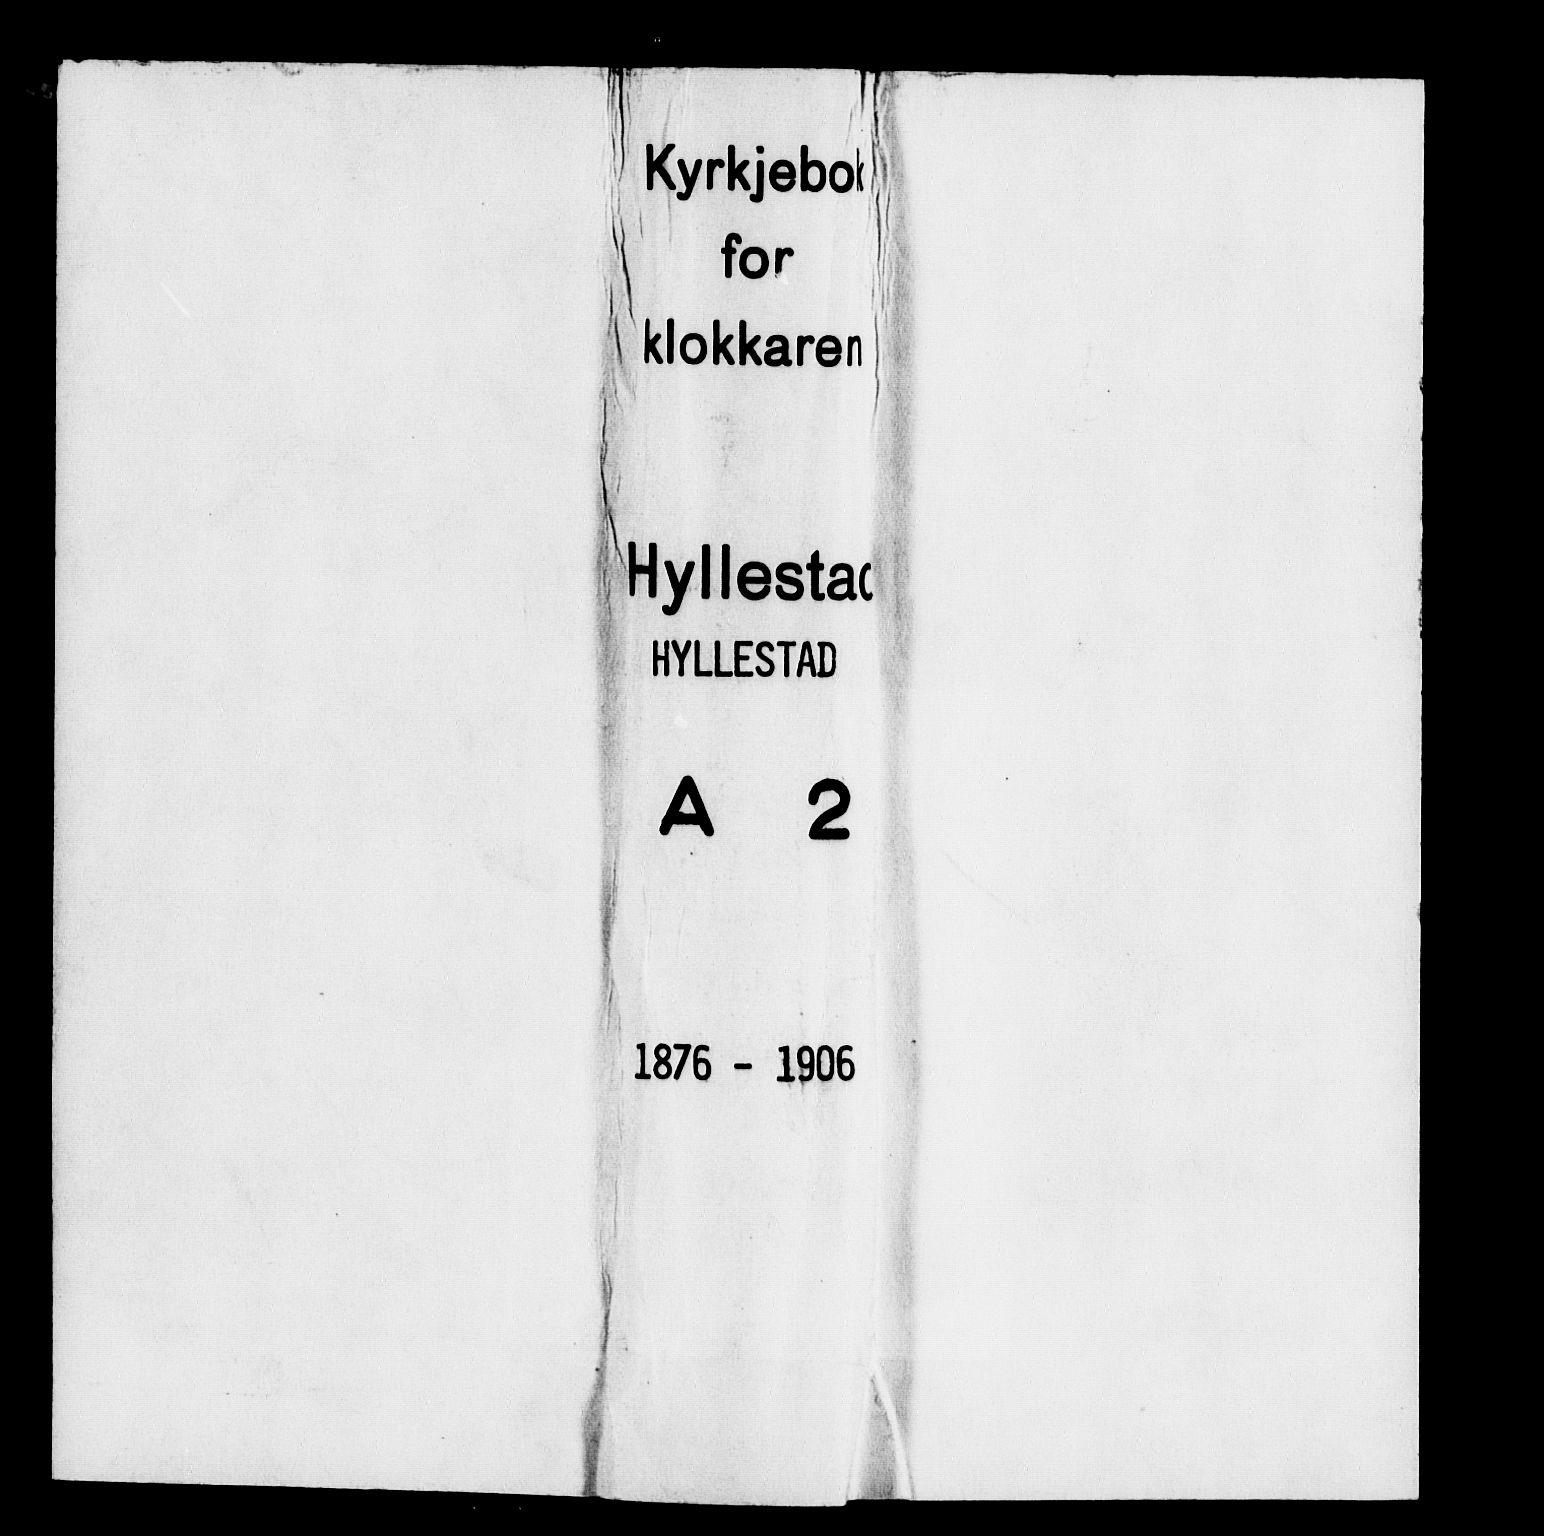 SAB, Hyllestad Sokneprestembete, Klokkerbok nr. A 2, 1876-1906